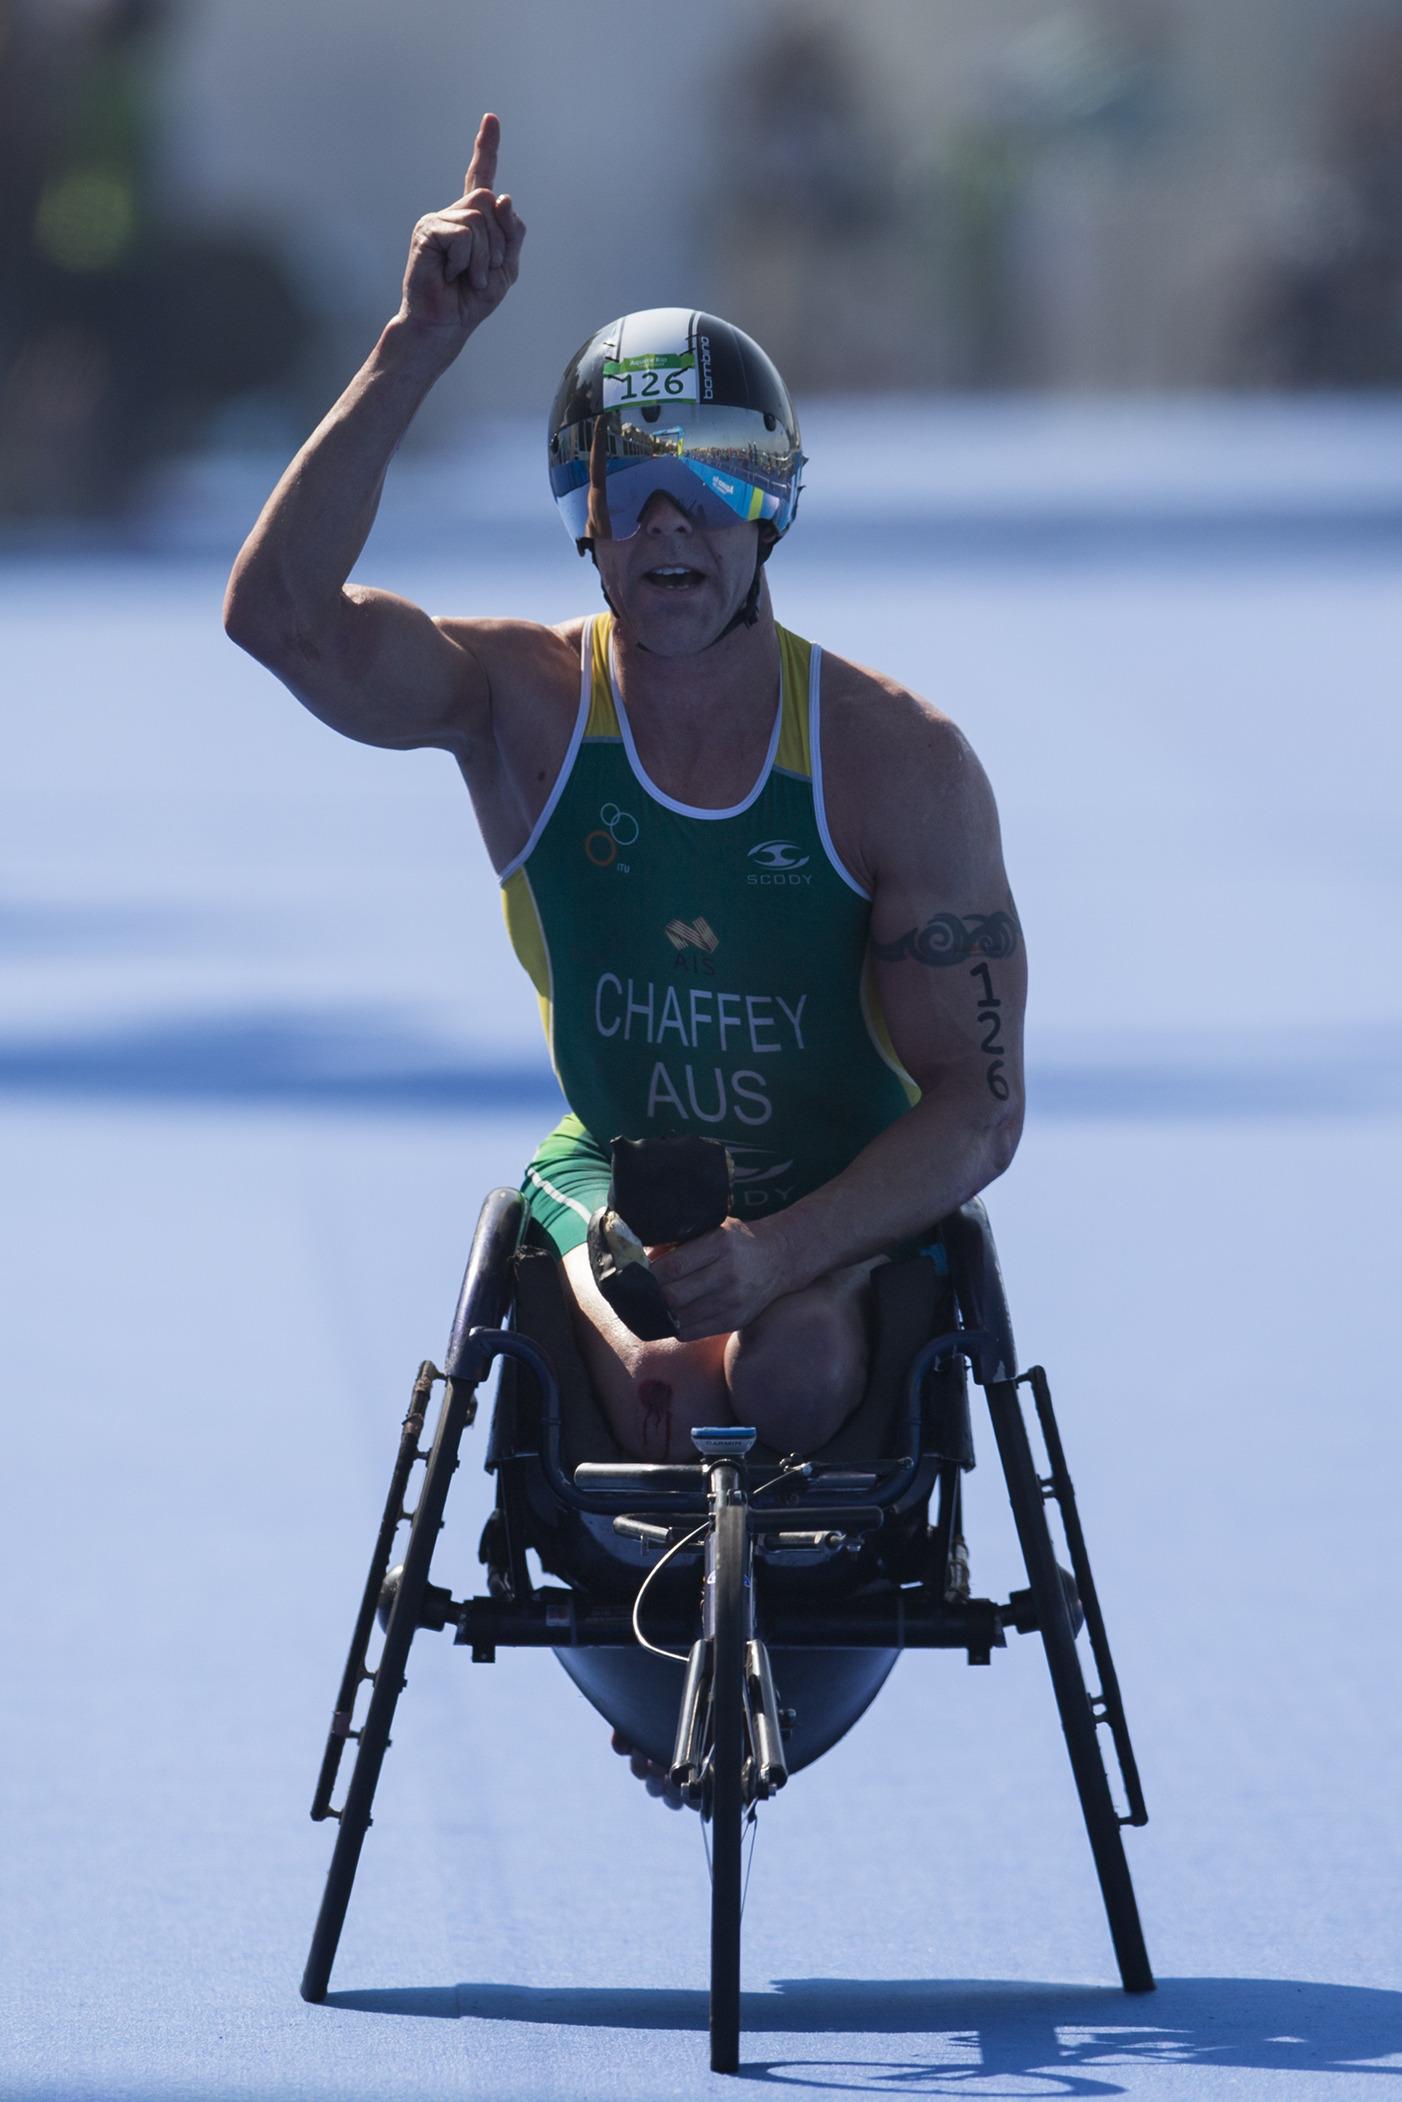 Bill Chaffey wins the paratriathlon test event in Rio last August.